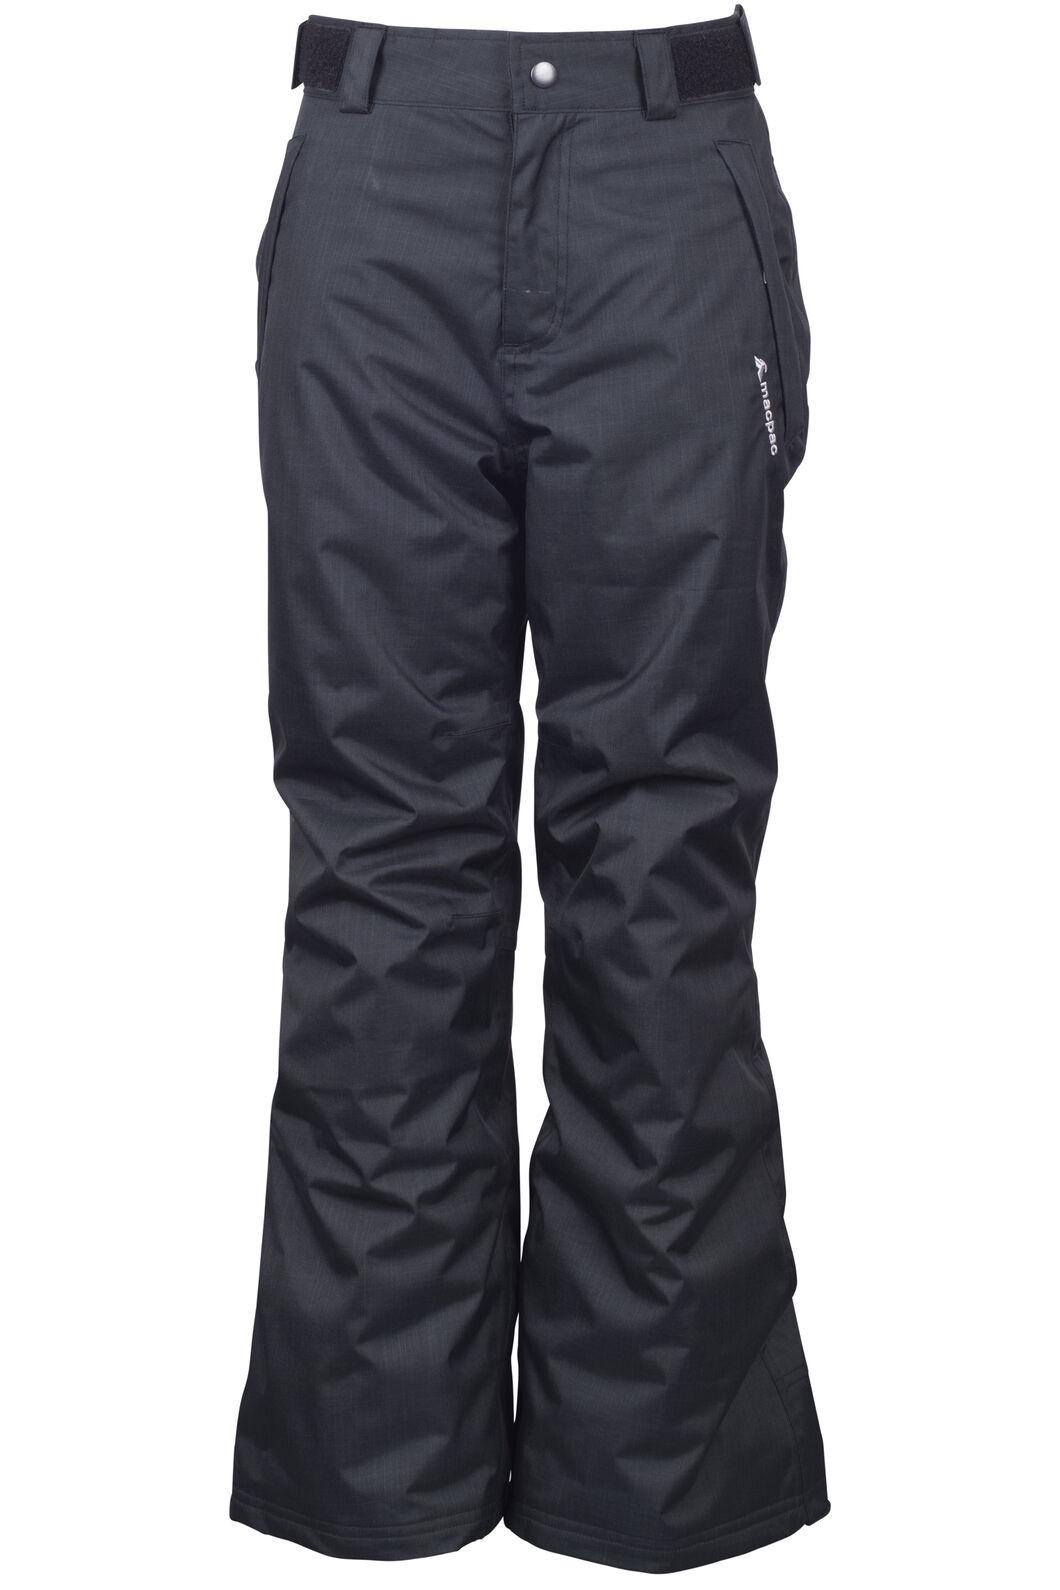 Macpac Powder Reflex™ Ski Pants — Kids', Black, hi-res